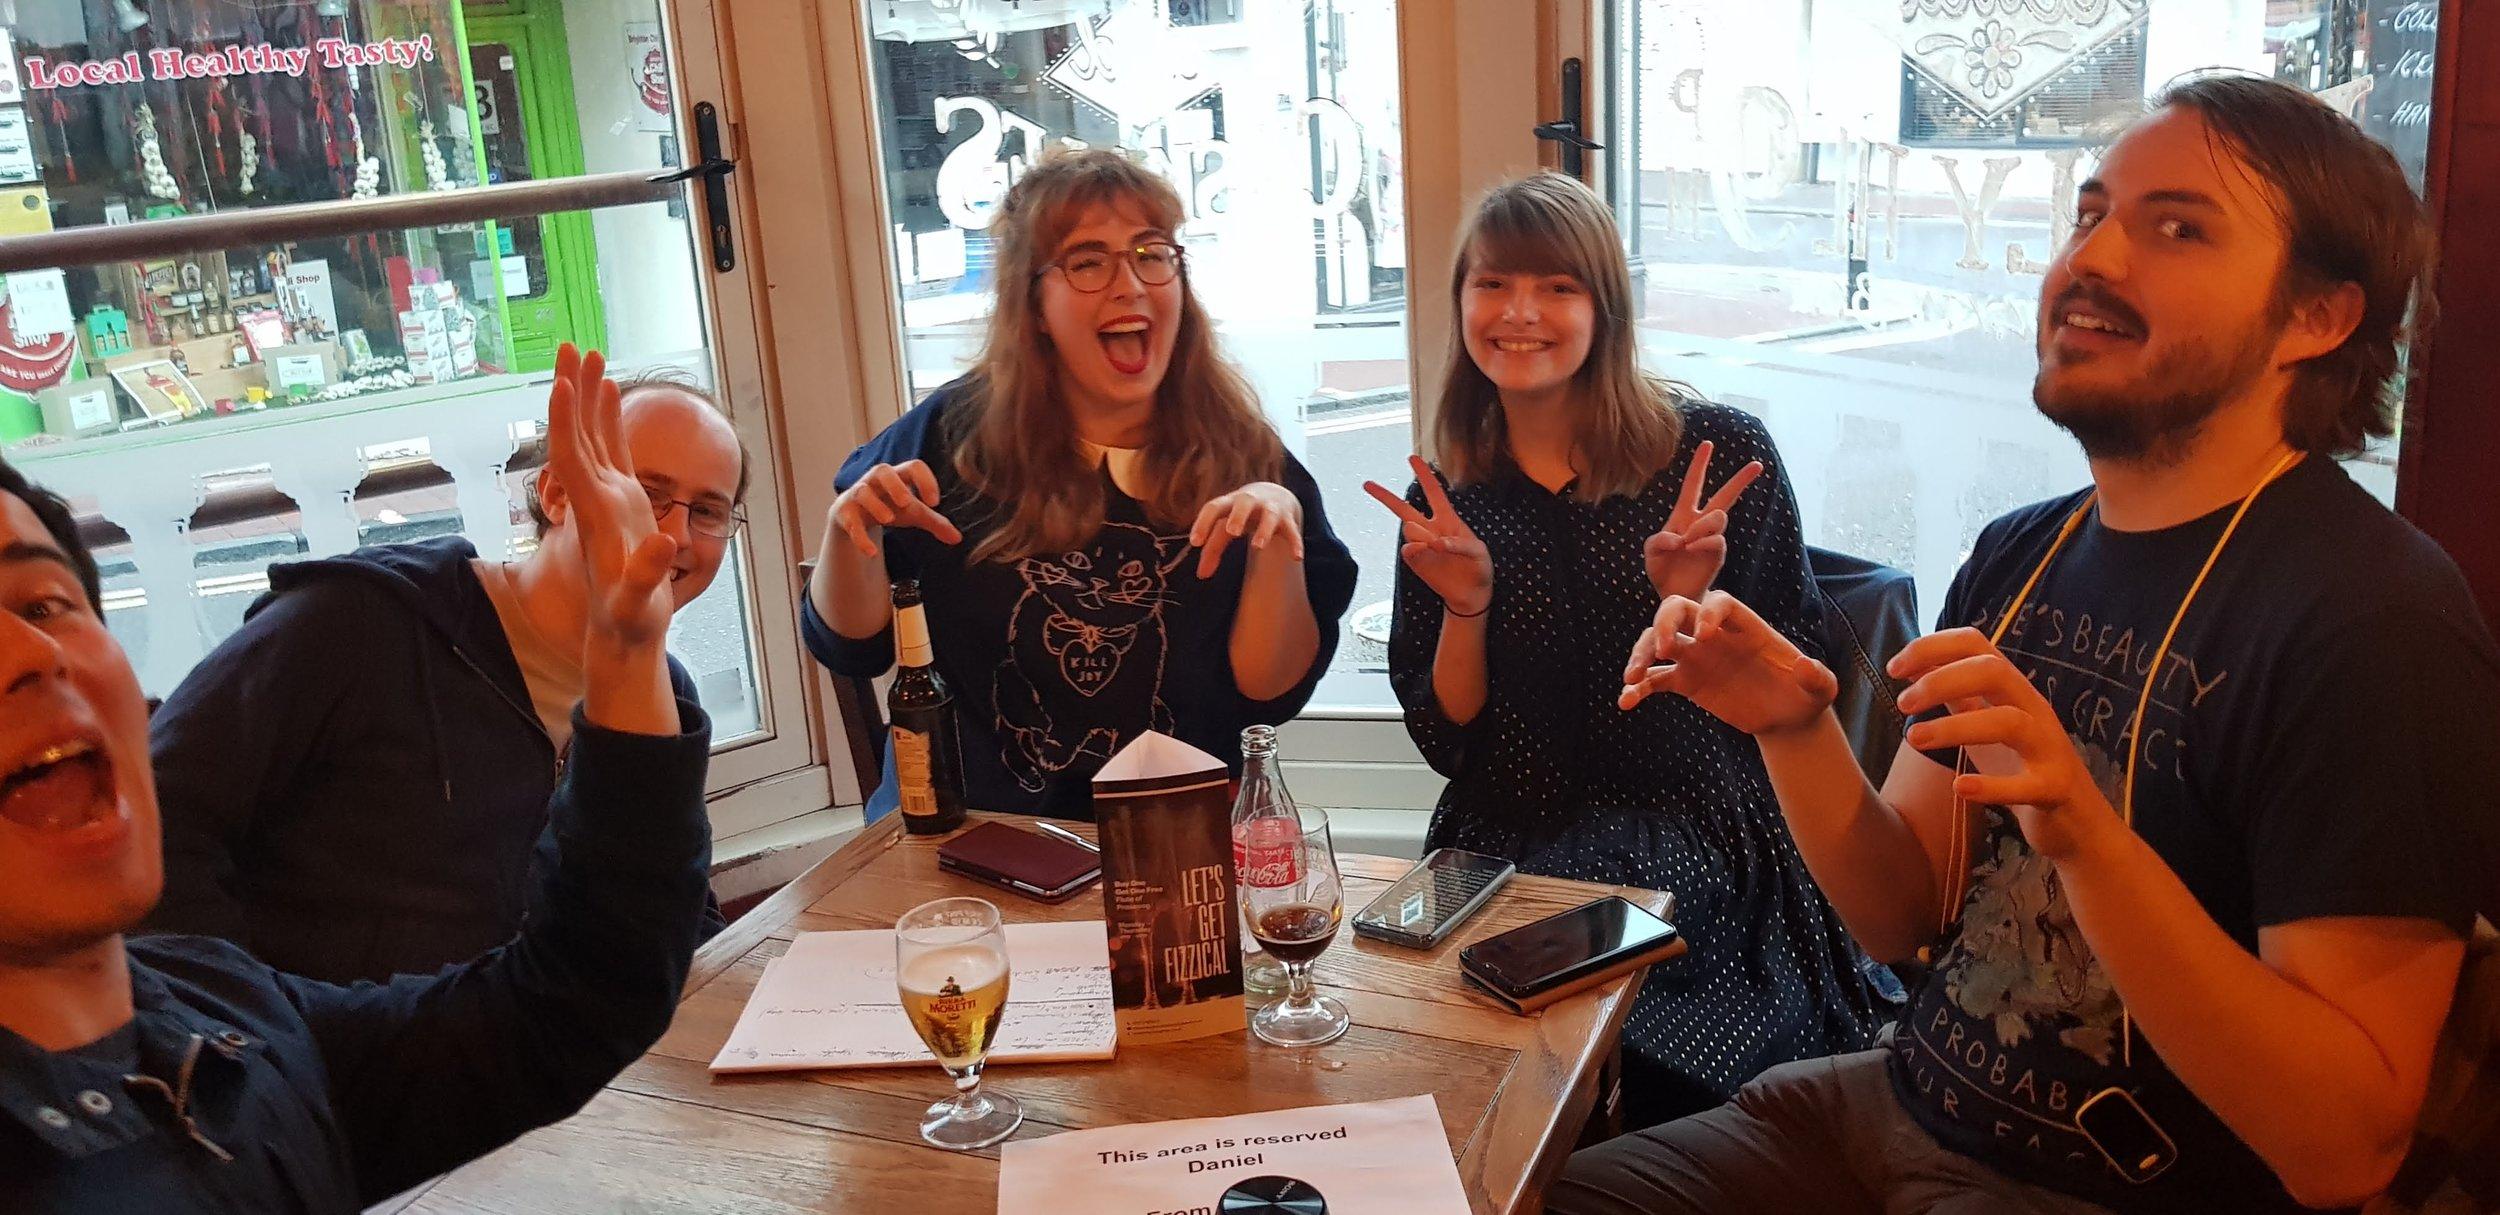 Step Up Japanese Japanese Lessons in Brighton Pub Quiz Fran Wrigley 2019 2.jpg